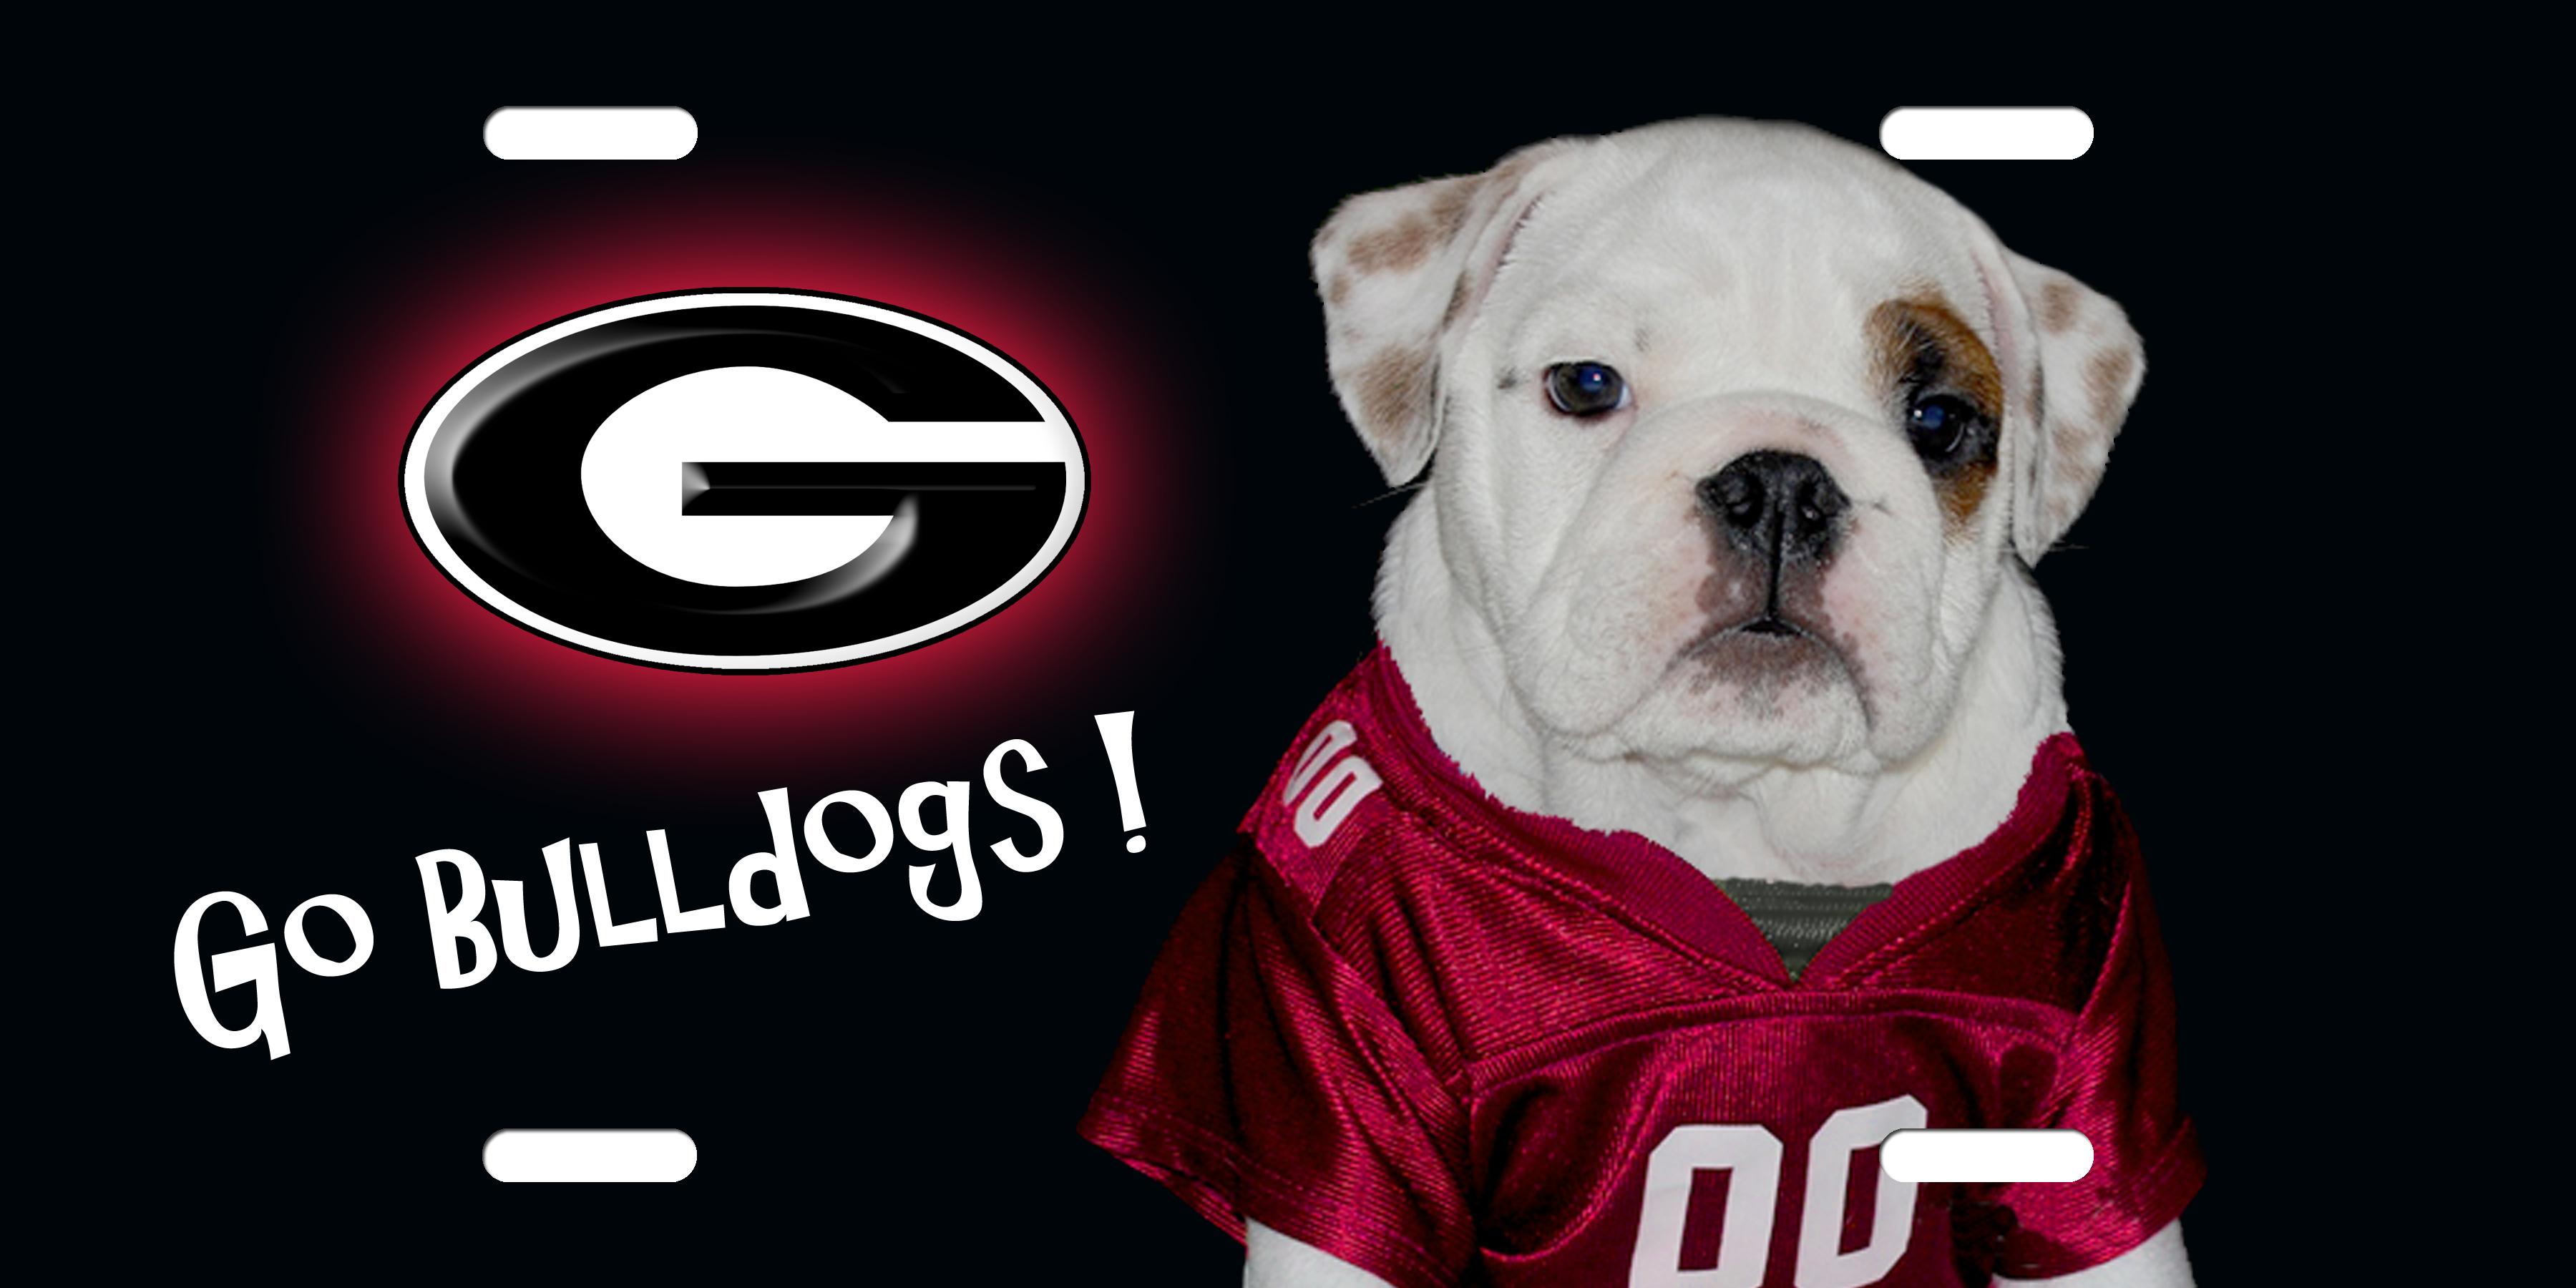 georgia bulldog License Plate georgia bulldog License Tag 3600x1800